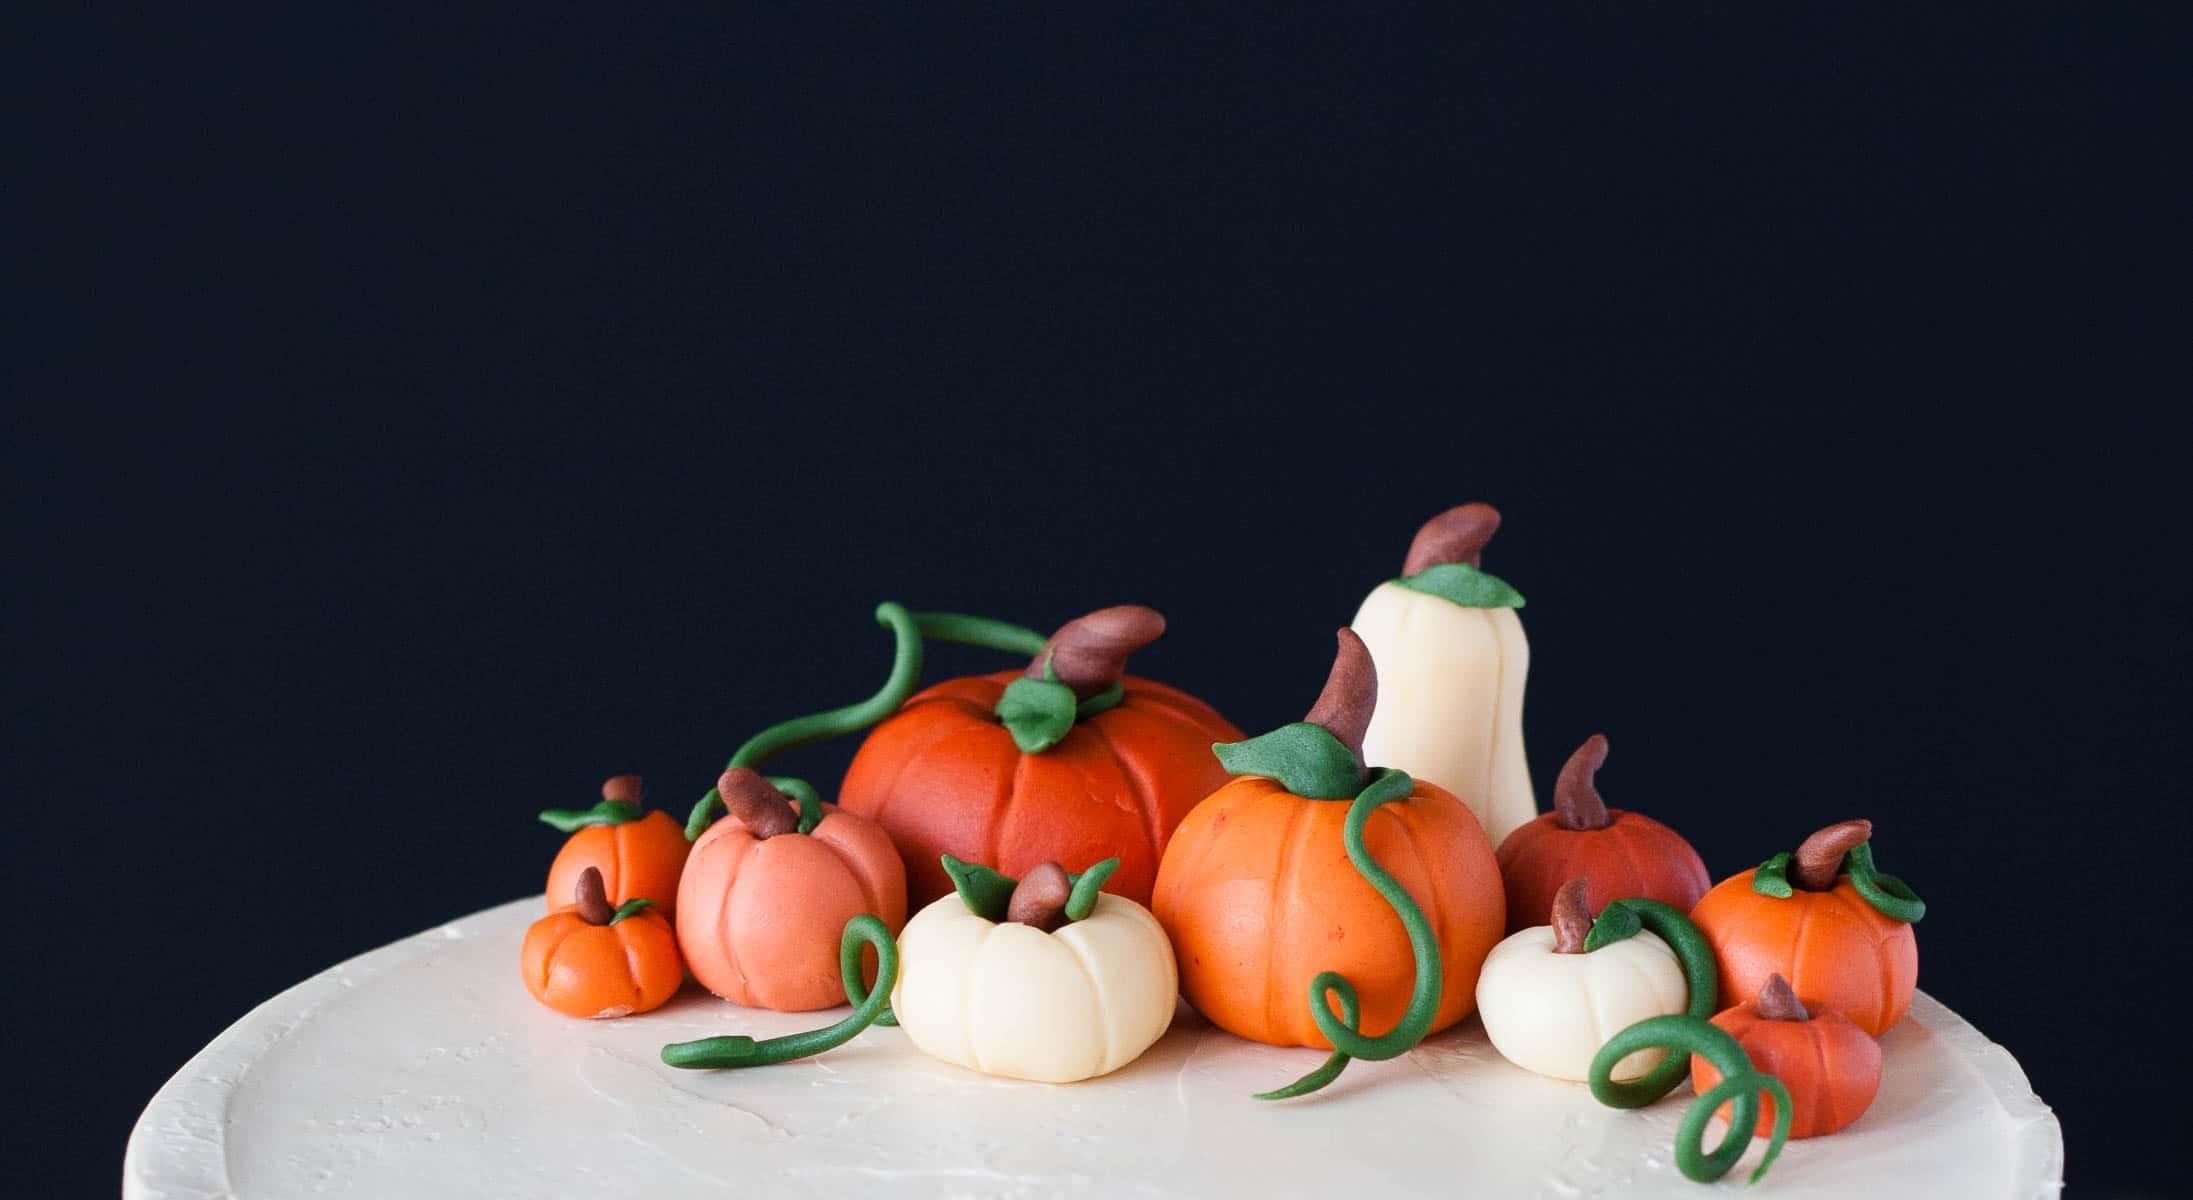 pumpkin_spice_latte_cake-1-2.jpg